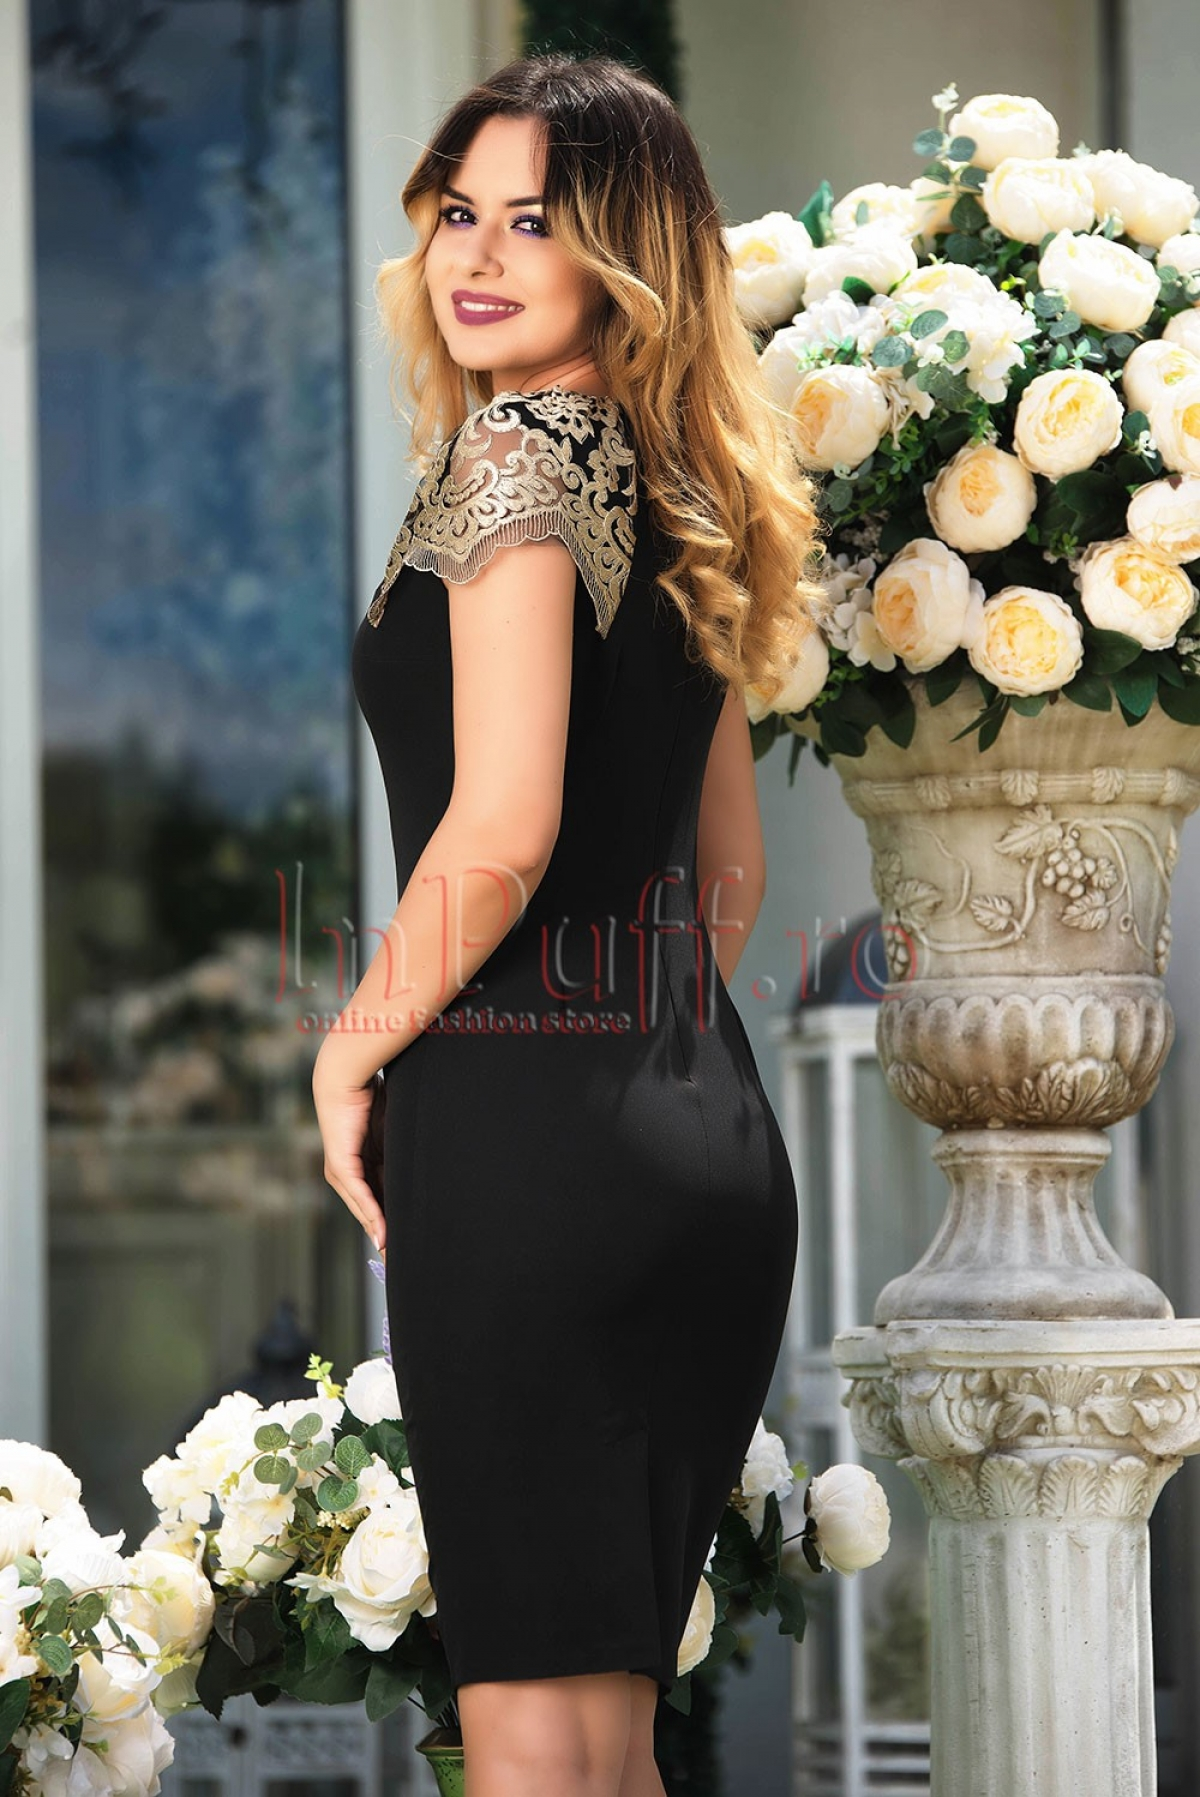 Rochie MBG eleganta neagra cu maneci din dantela aurie